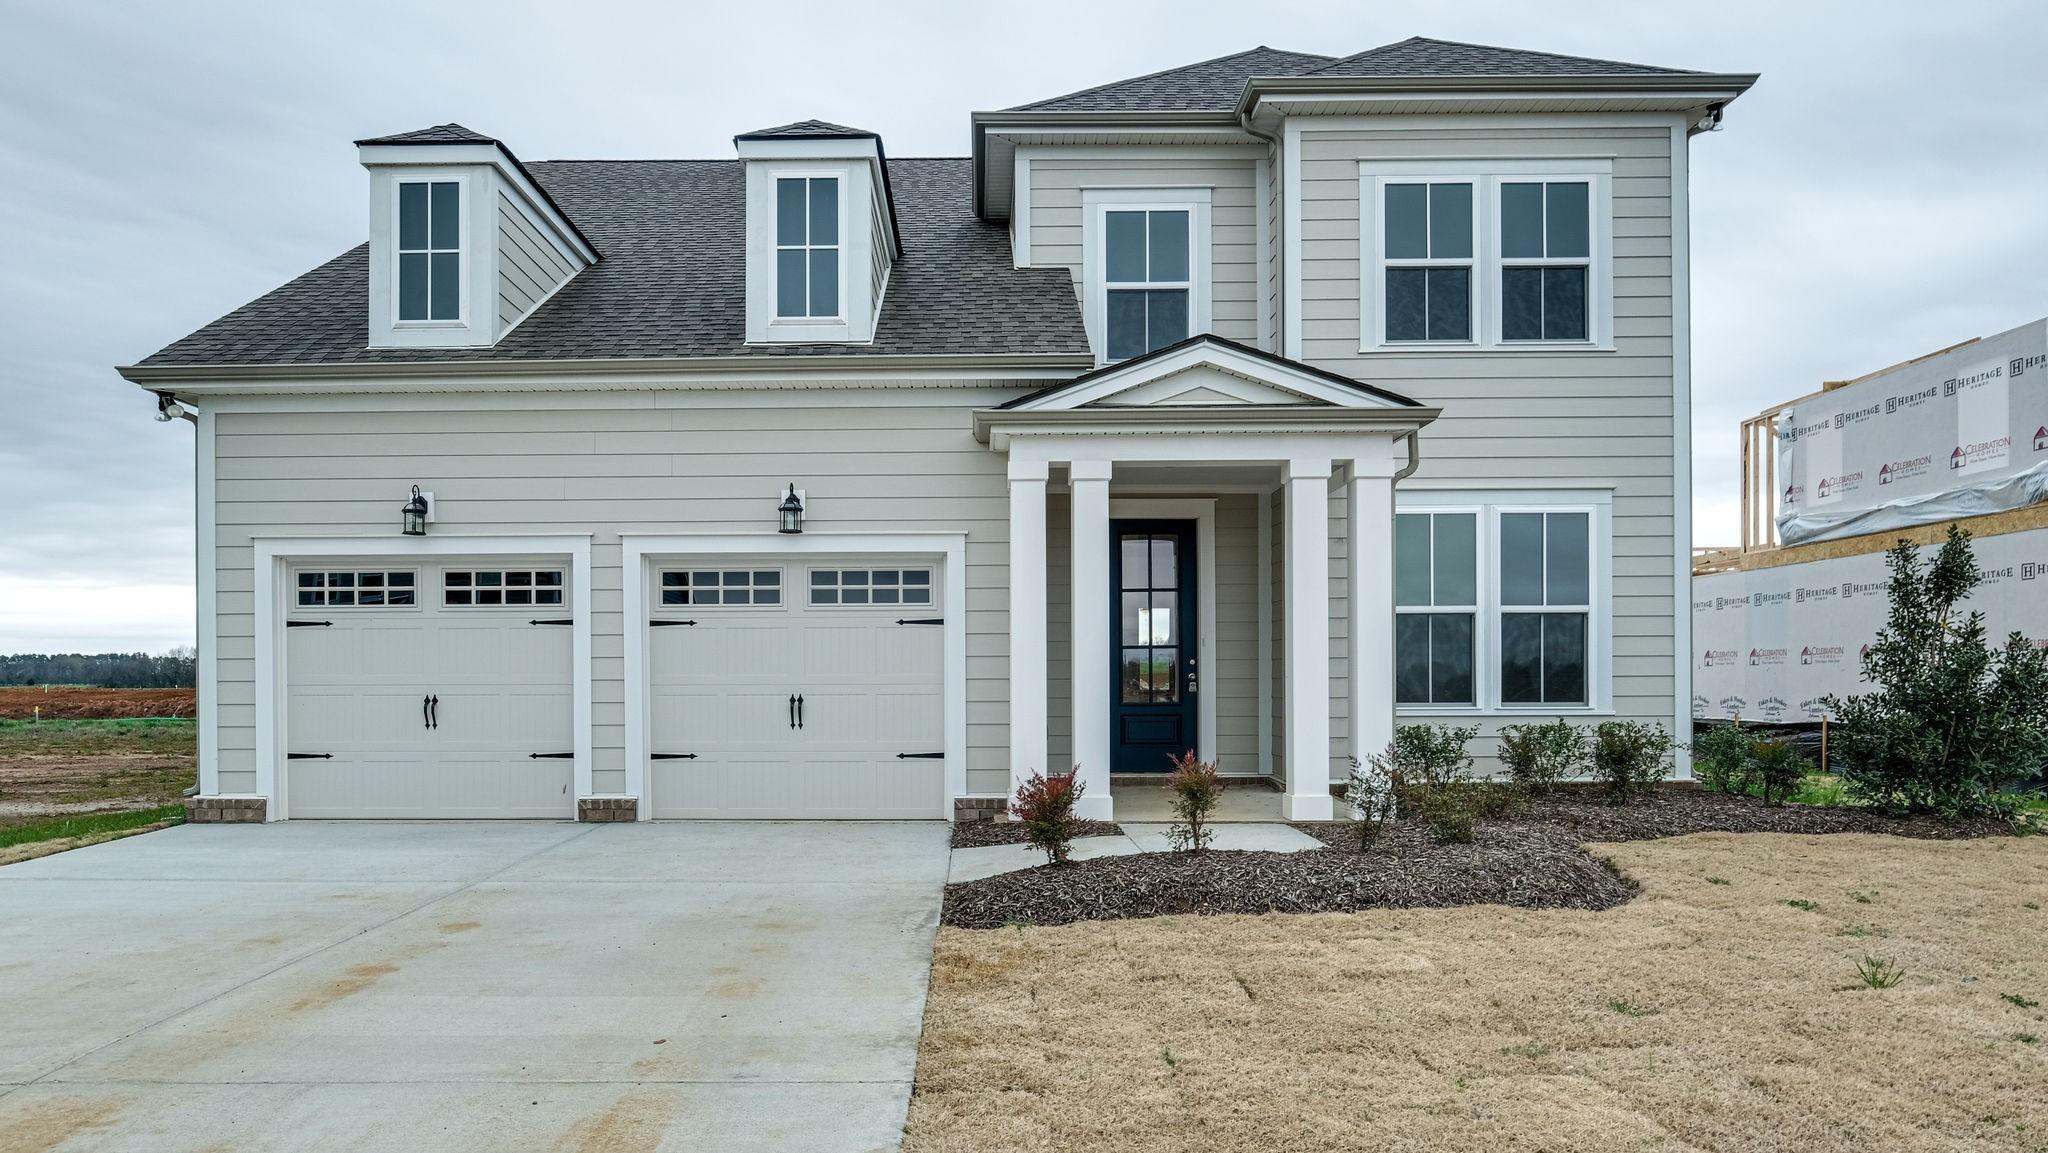 5535 Shelton Blvd (87), Murfreesboro, TN 37129 - Murfreesboro, TN real estate listing